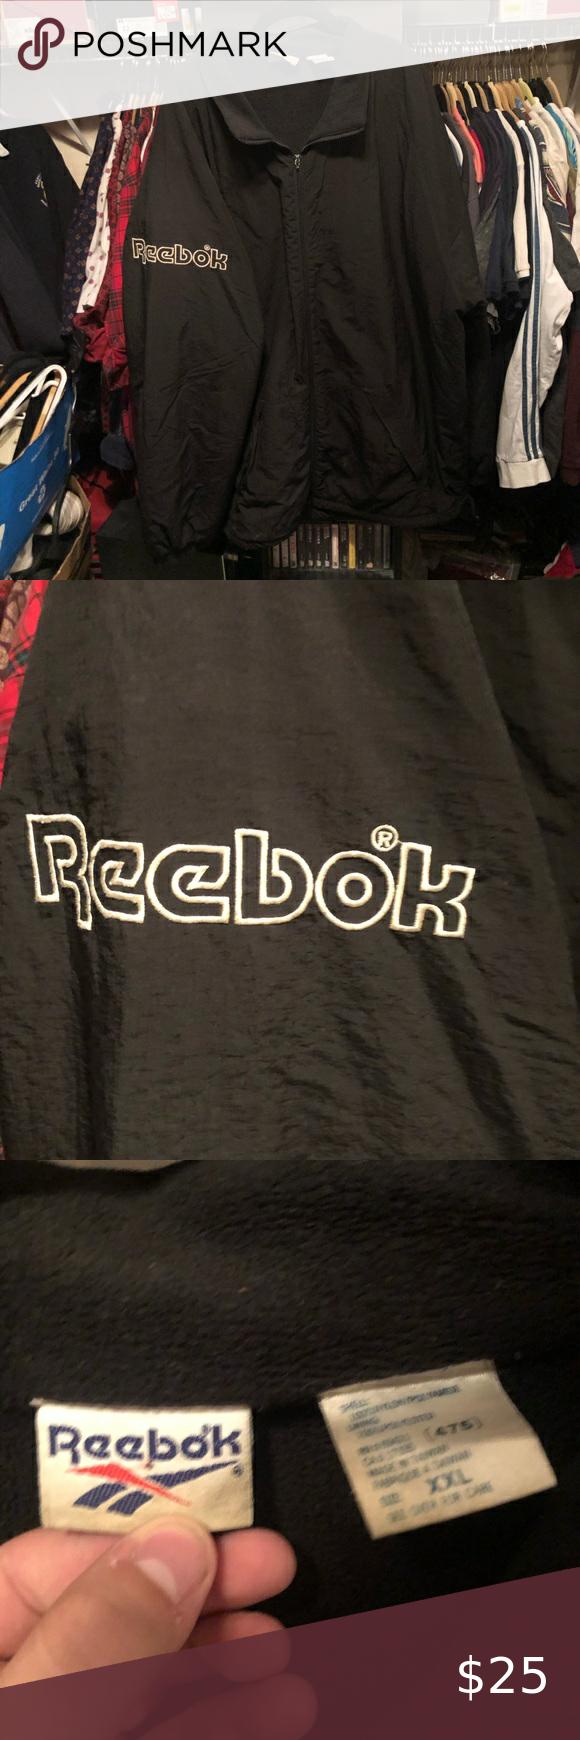 Vintage Reebok Spell Out Puffer Jacket Puffer Jackets Reebok Clothes Design [ 1740 x 580 Pixel ]